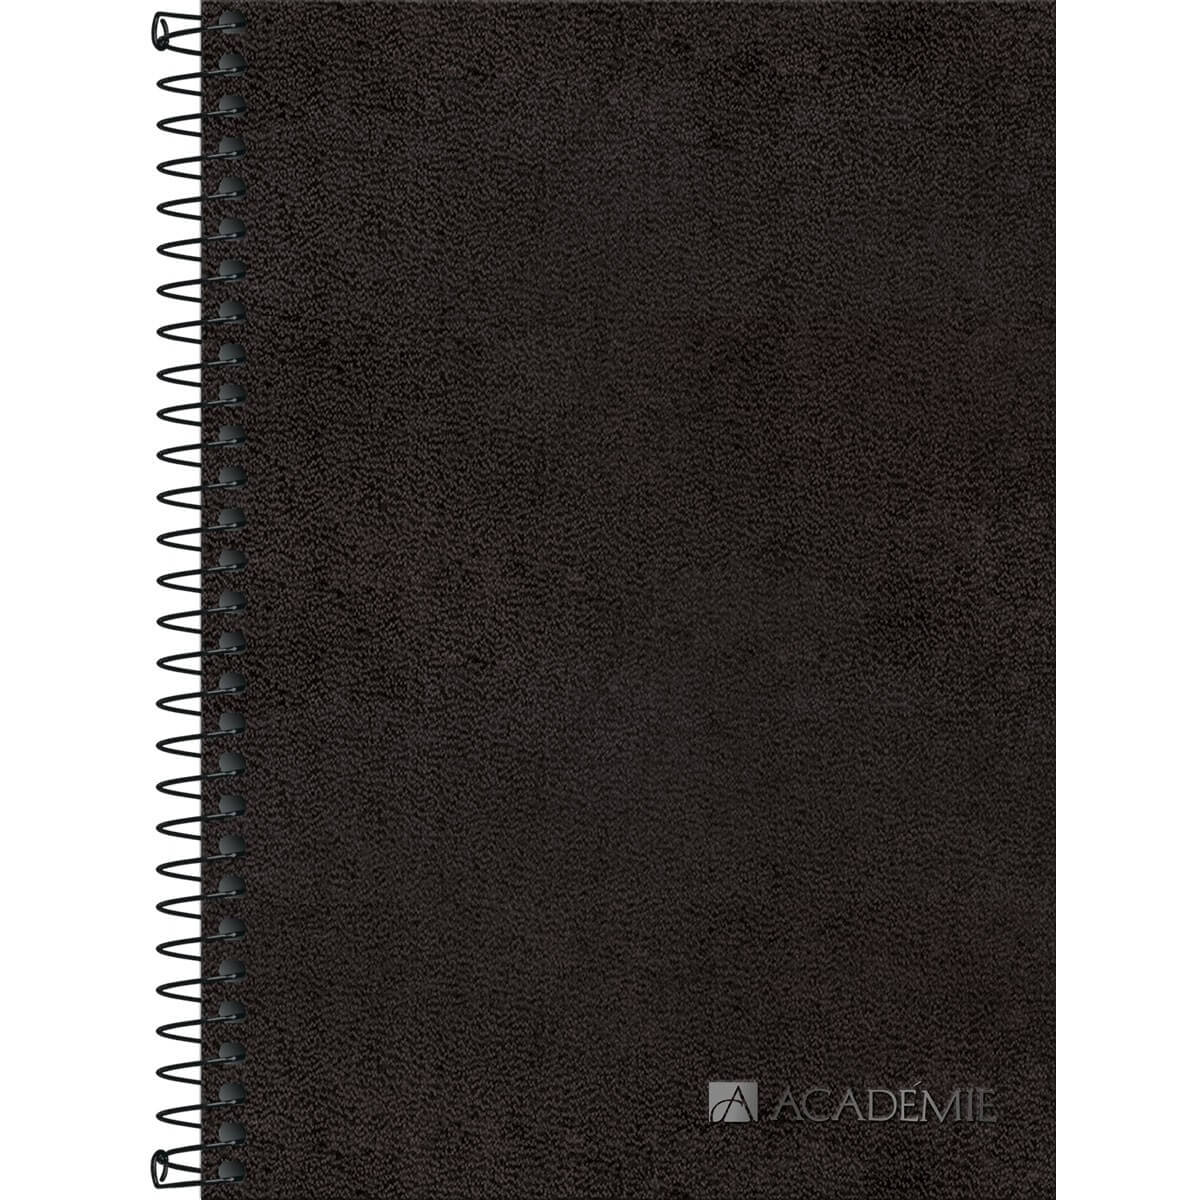 Caderno Sketchbook Espiral Capa Dura A5 Académie Sense 150g 50 Folhas